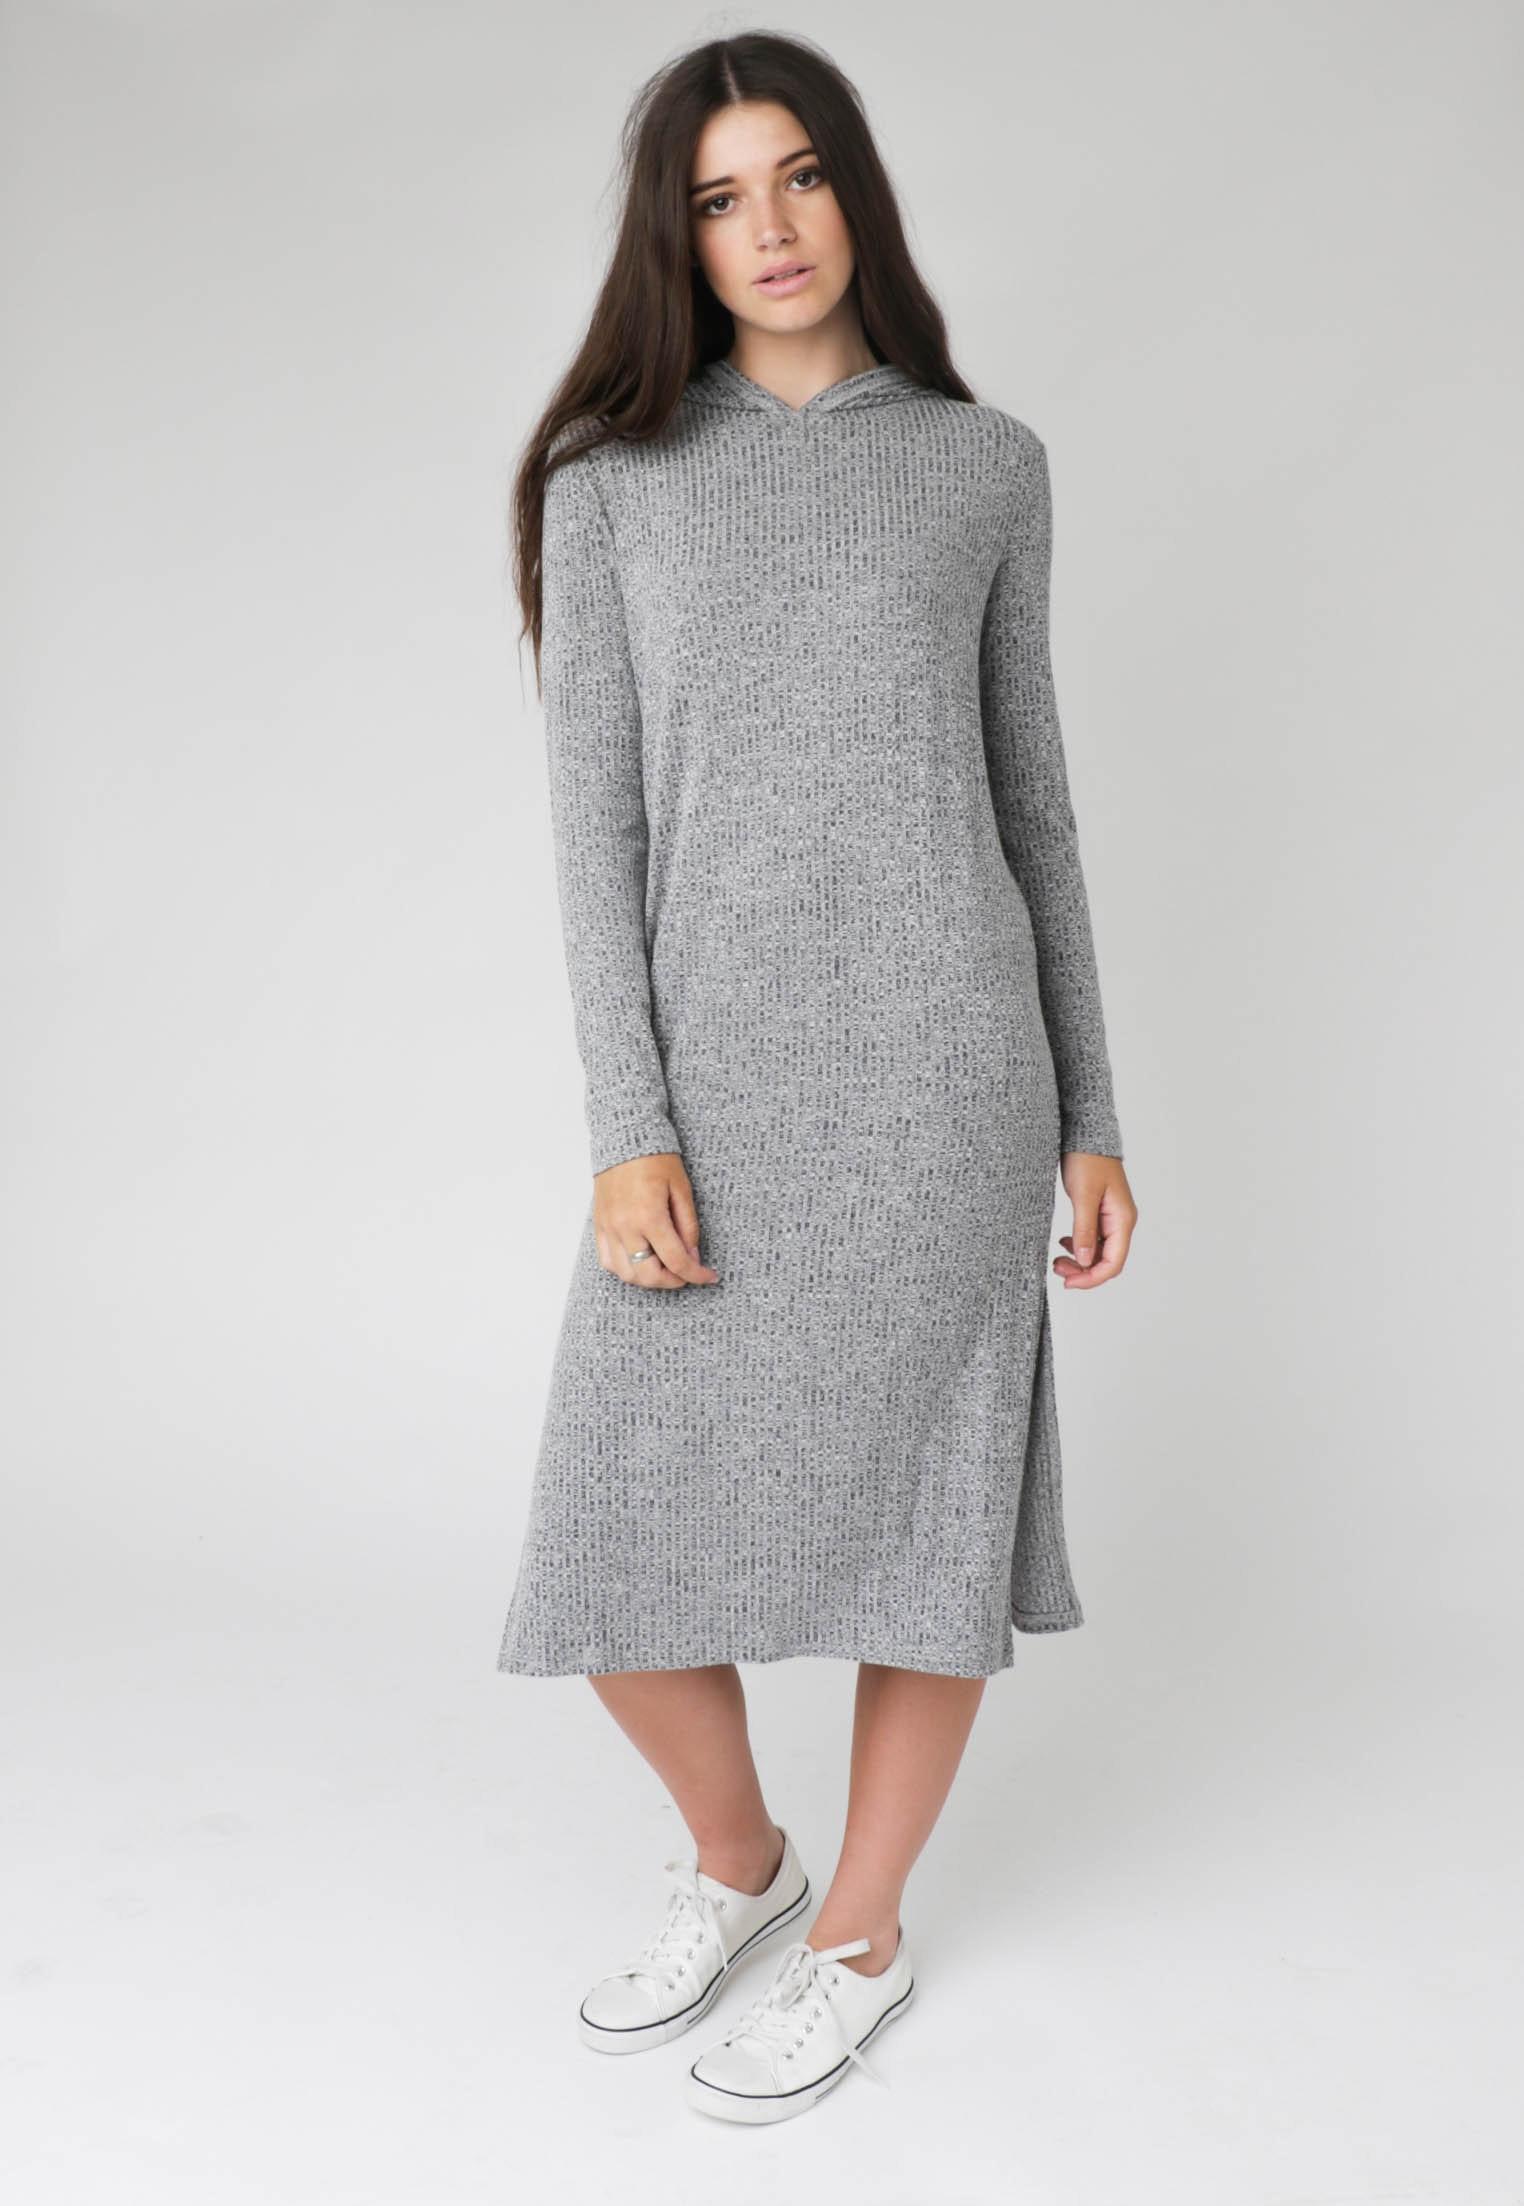 Silent Theory - Hideaway Hoody Dress - Charcoal